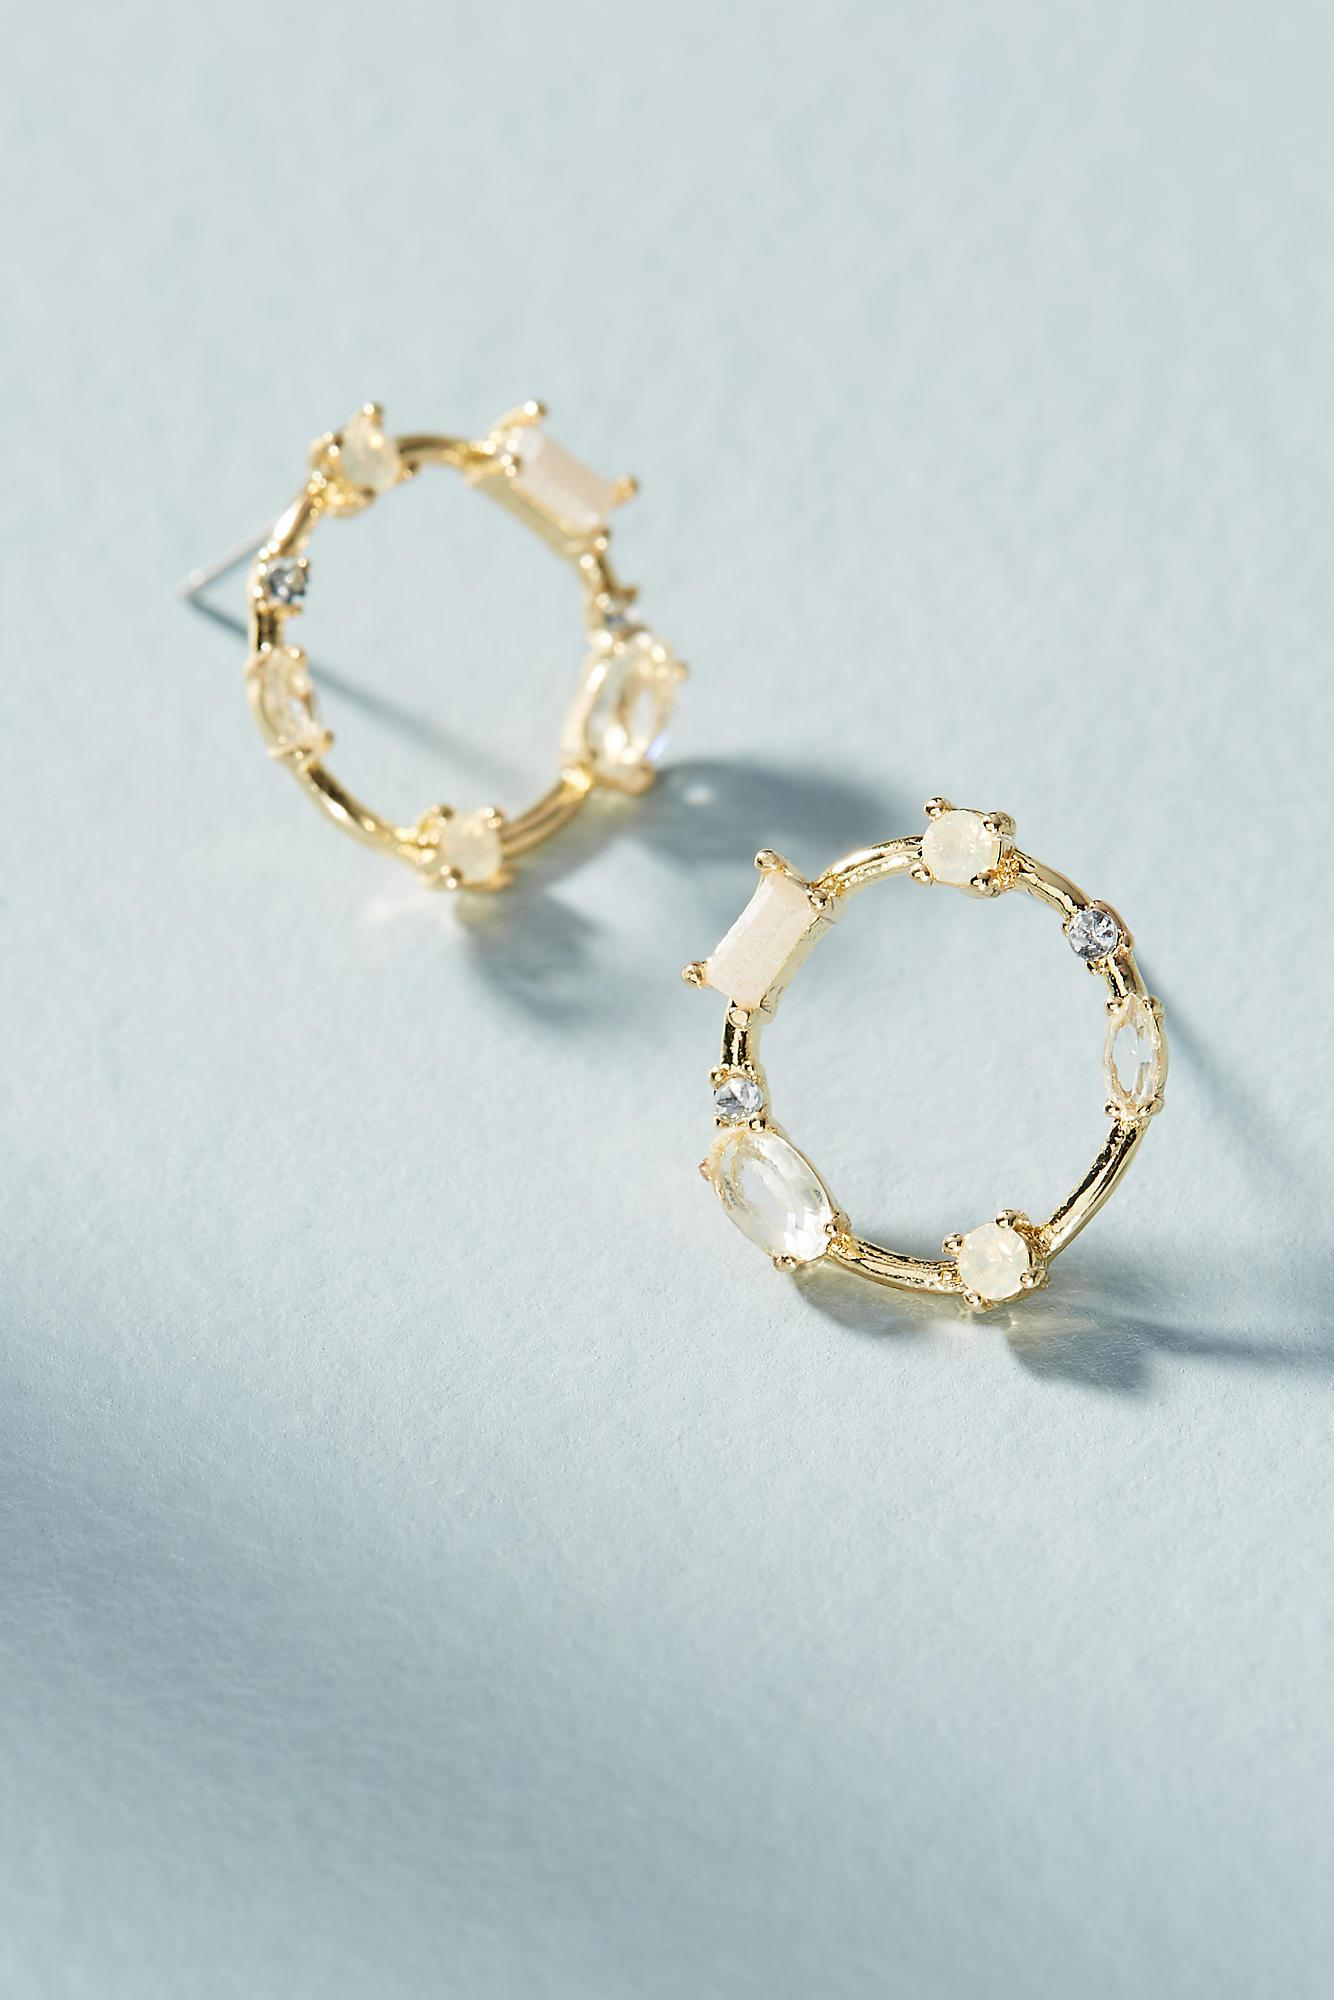 Anthropologie Cerise Petite Hooped Post Earrings sQj3Frz